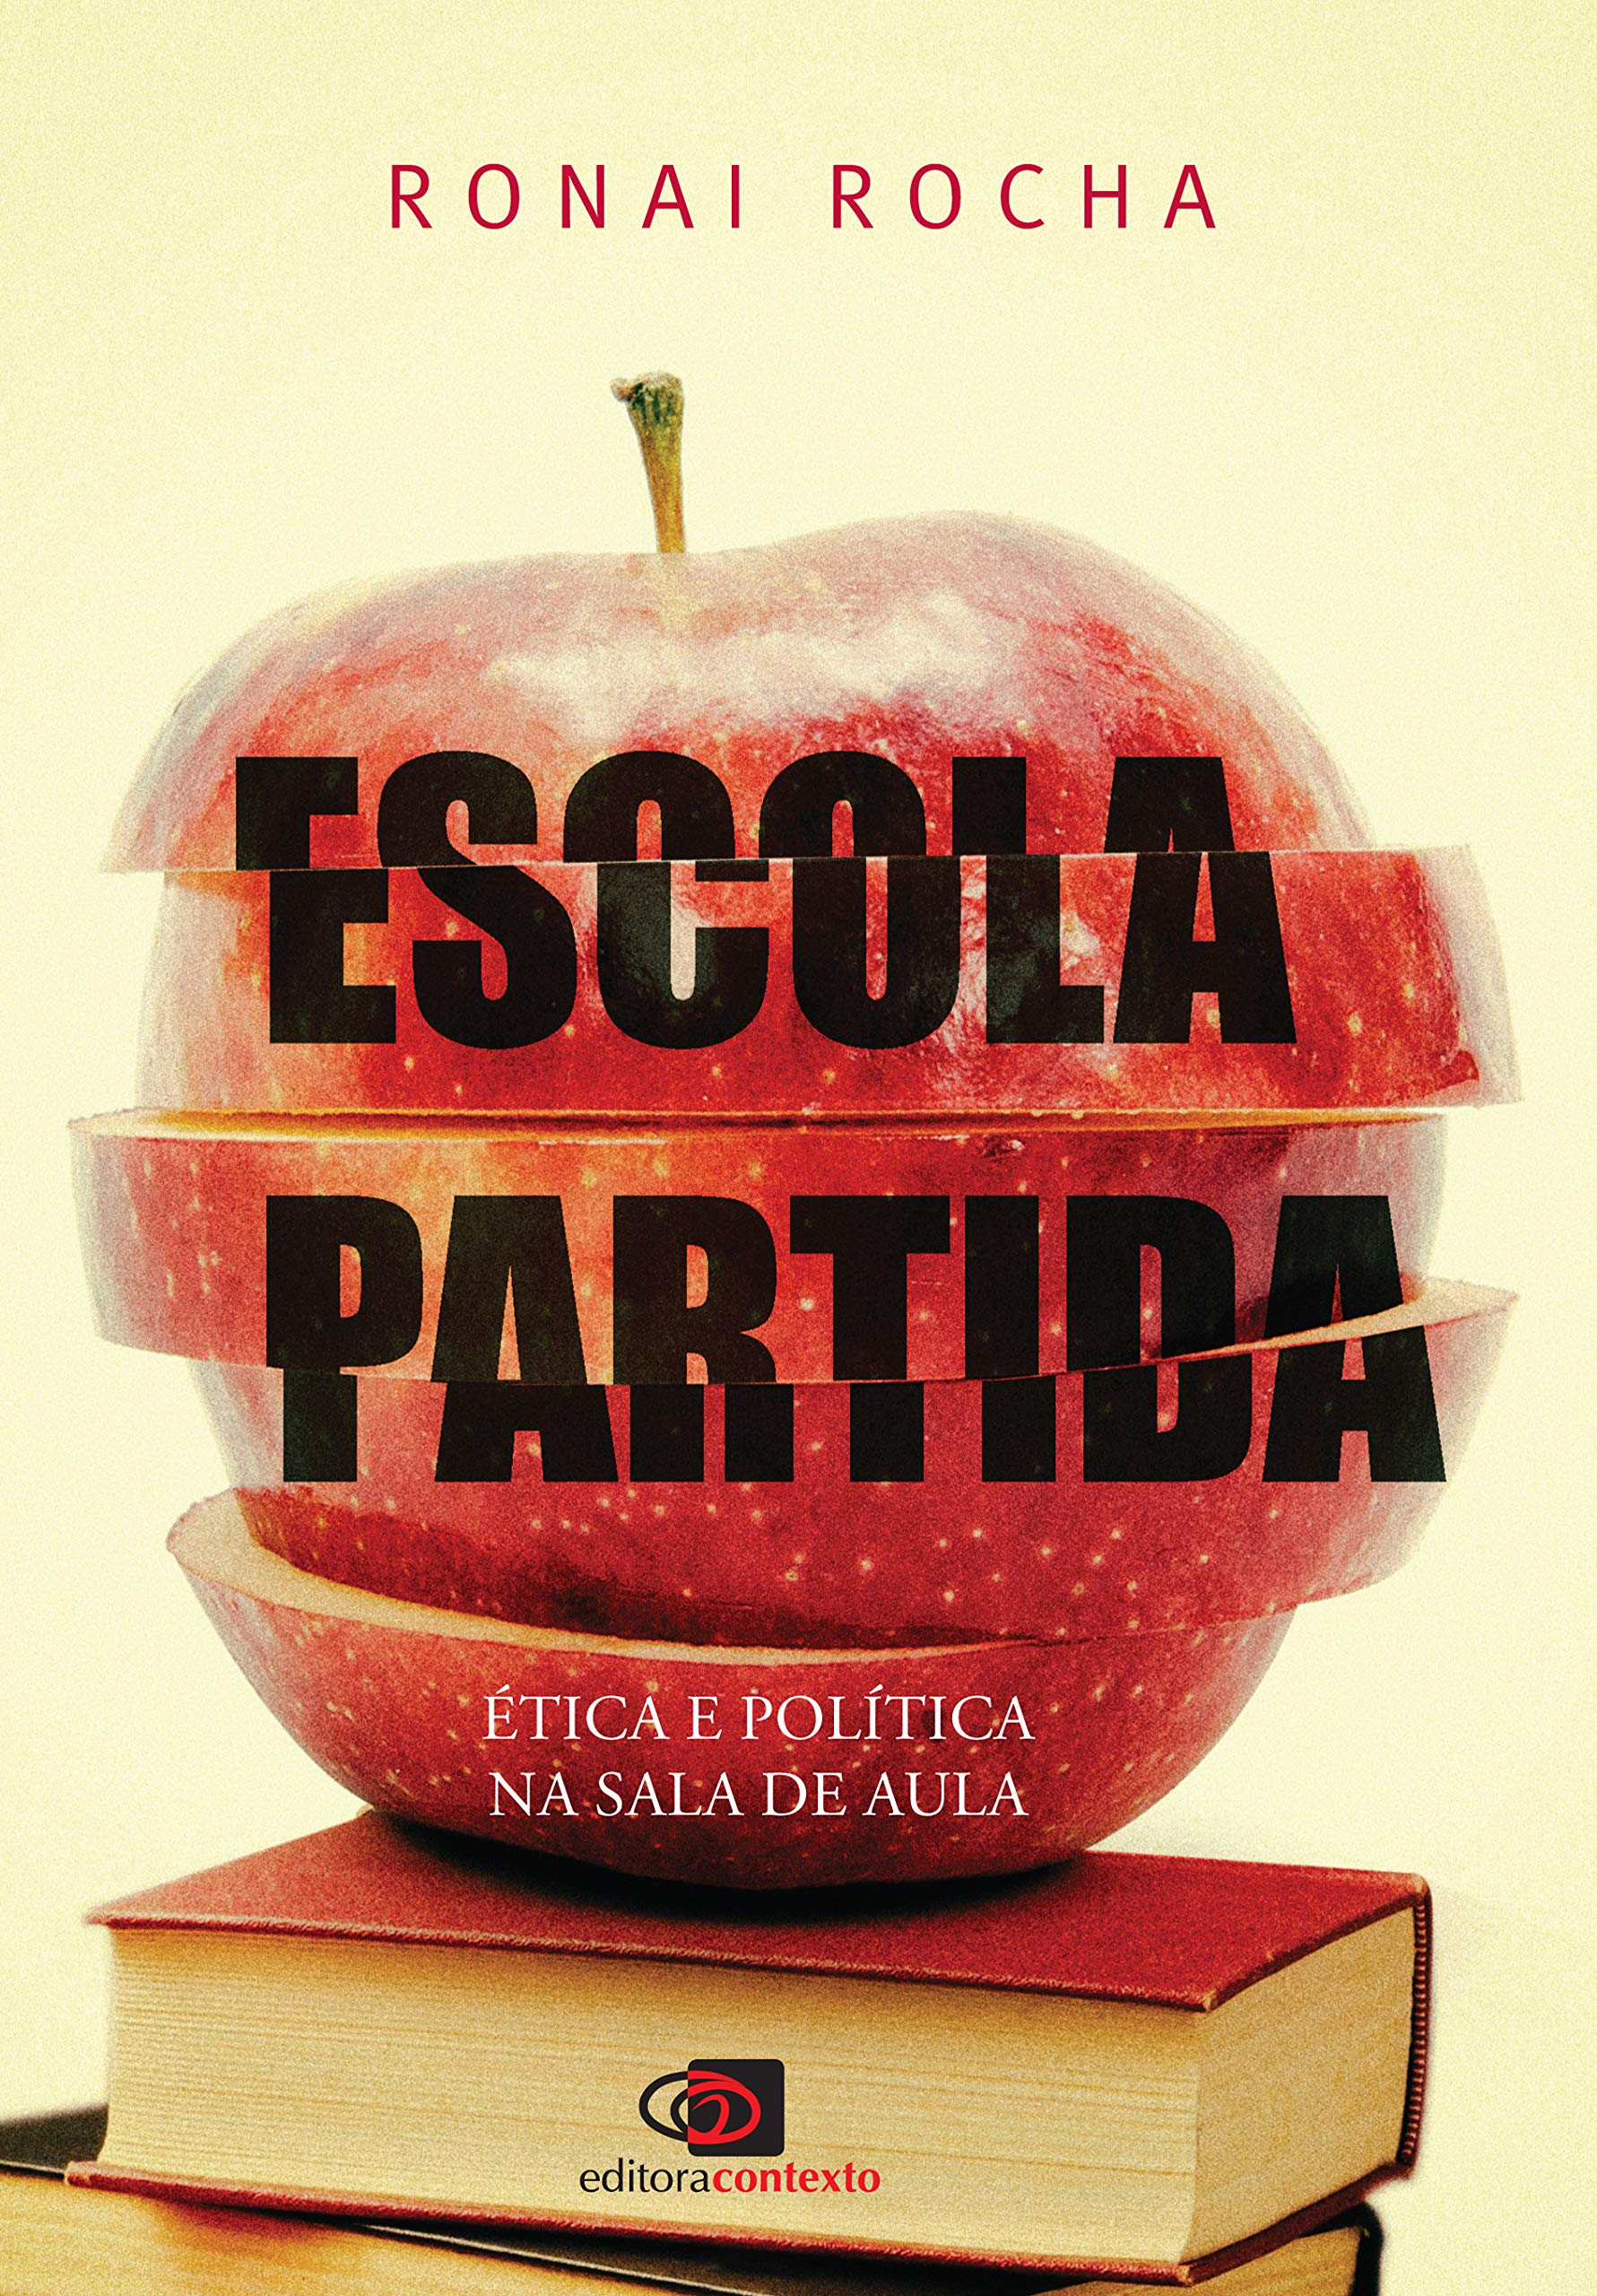 Livro 'Escola Partida' por Ronai Rocha